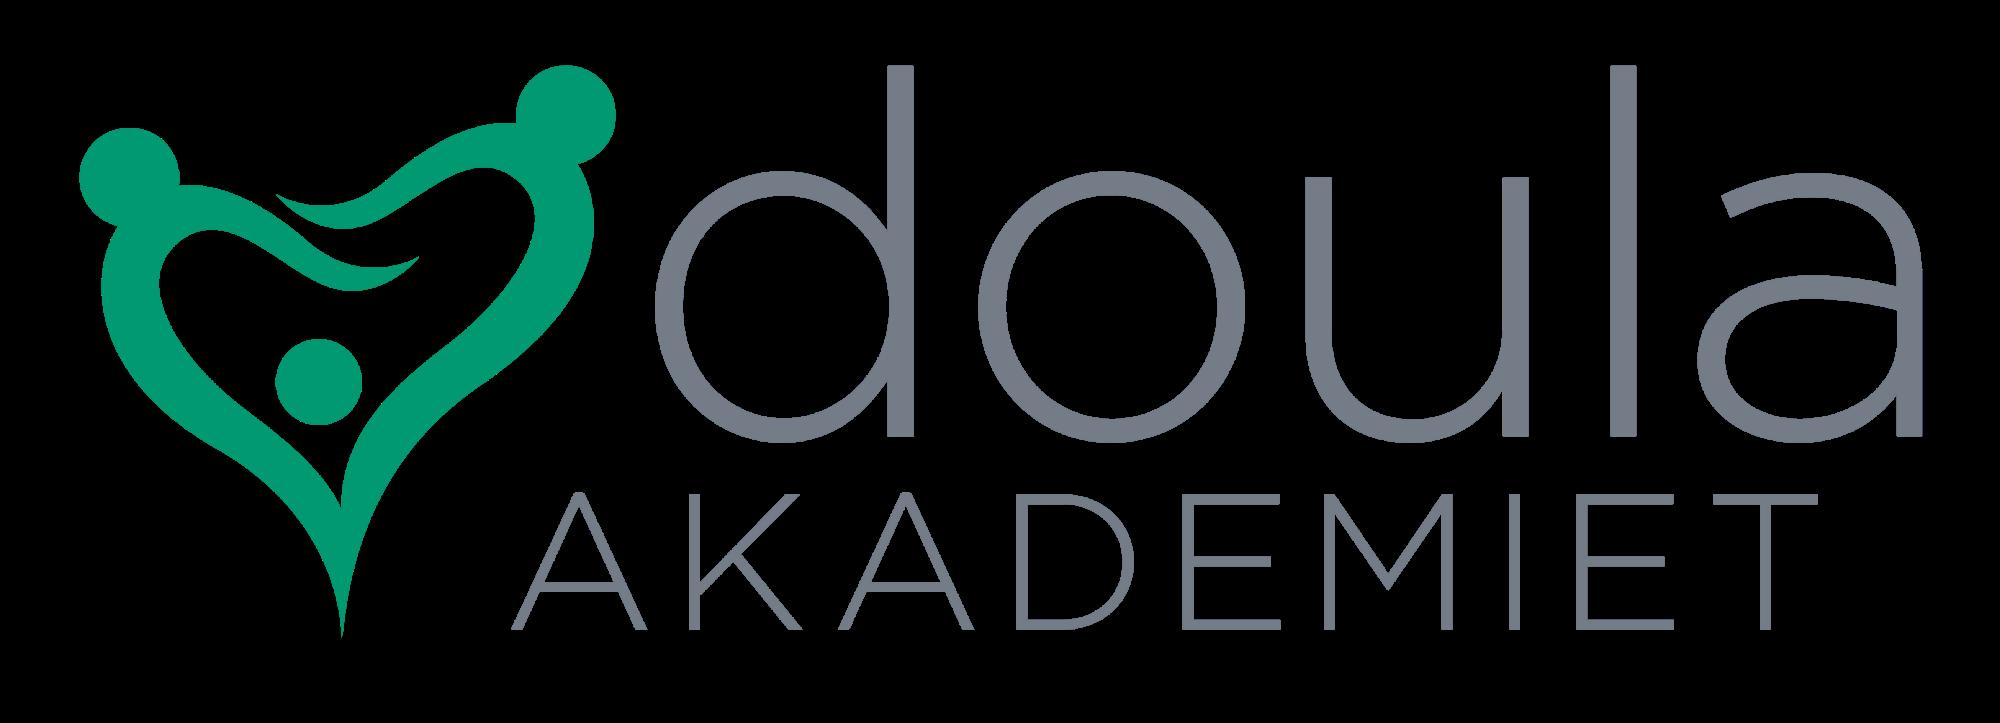 Doula-Akademiet